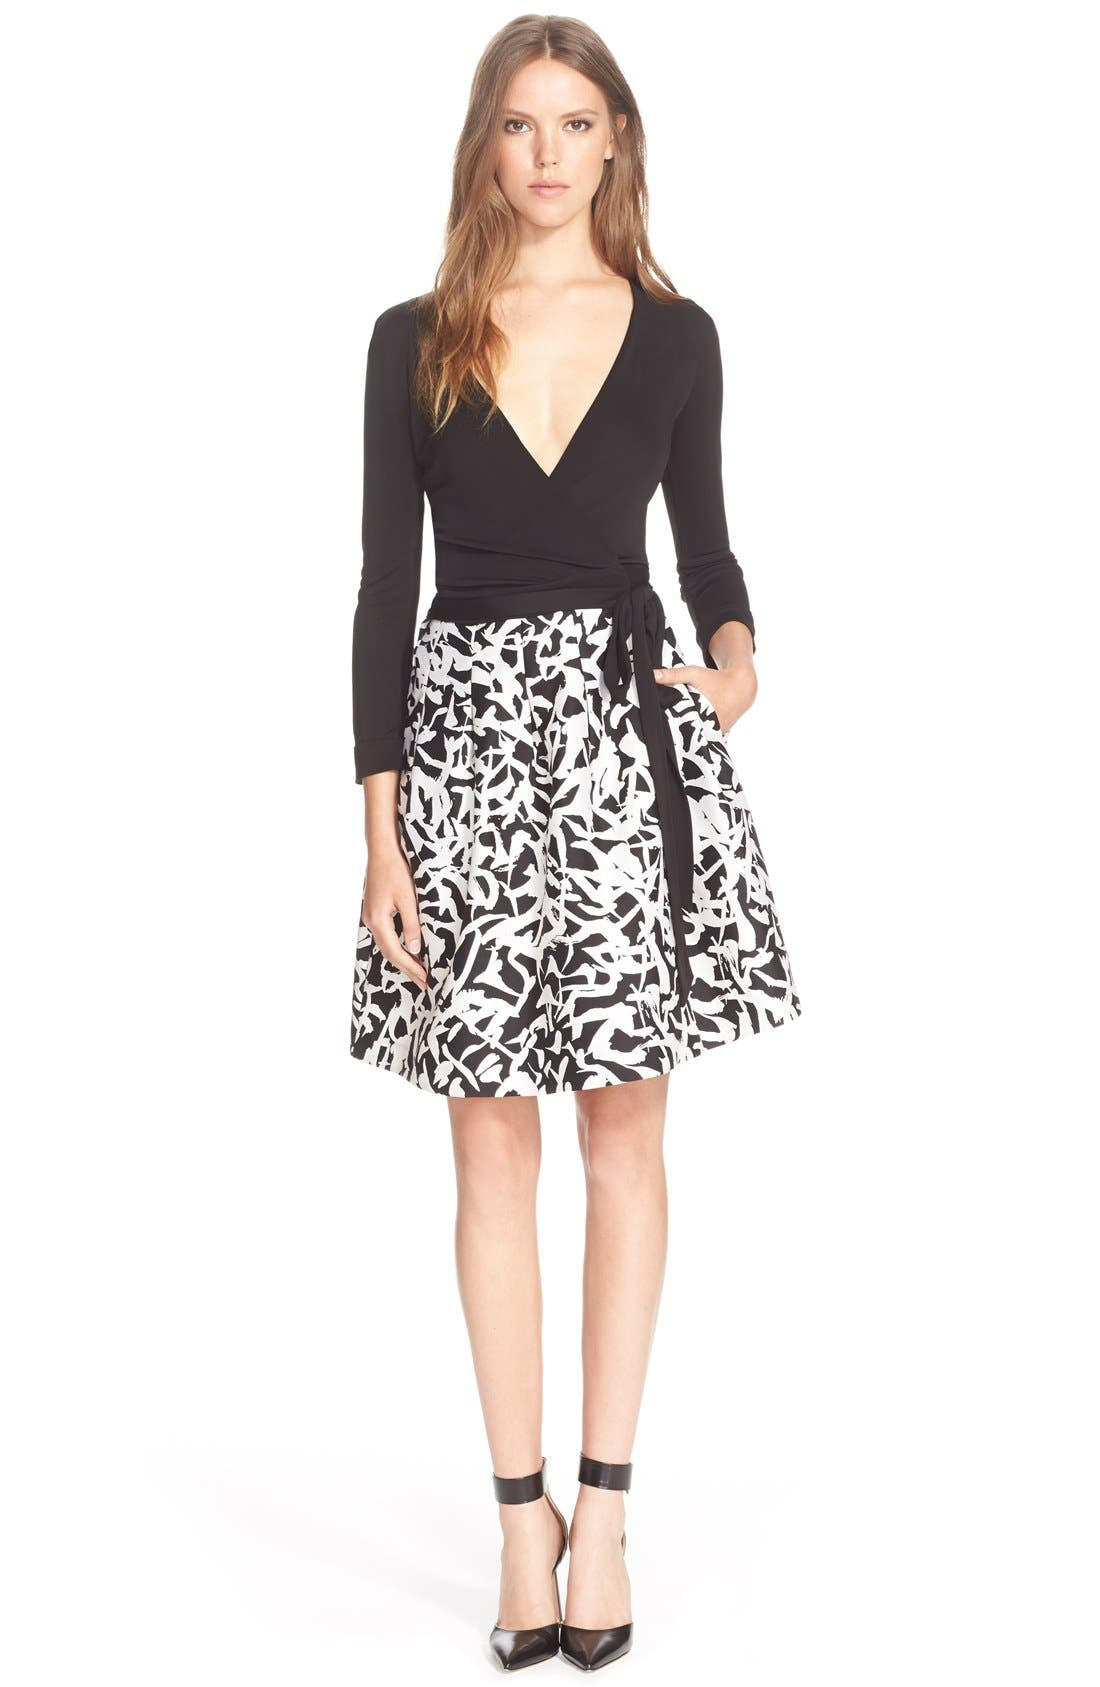 Alternate Image 1 Selected - Diane vonFurstenberg'Jewel' Wrap Dress